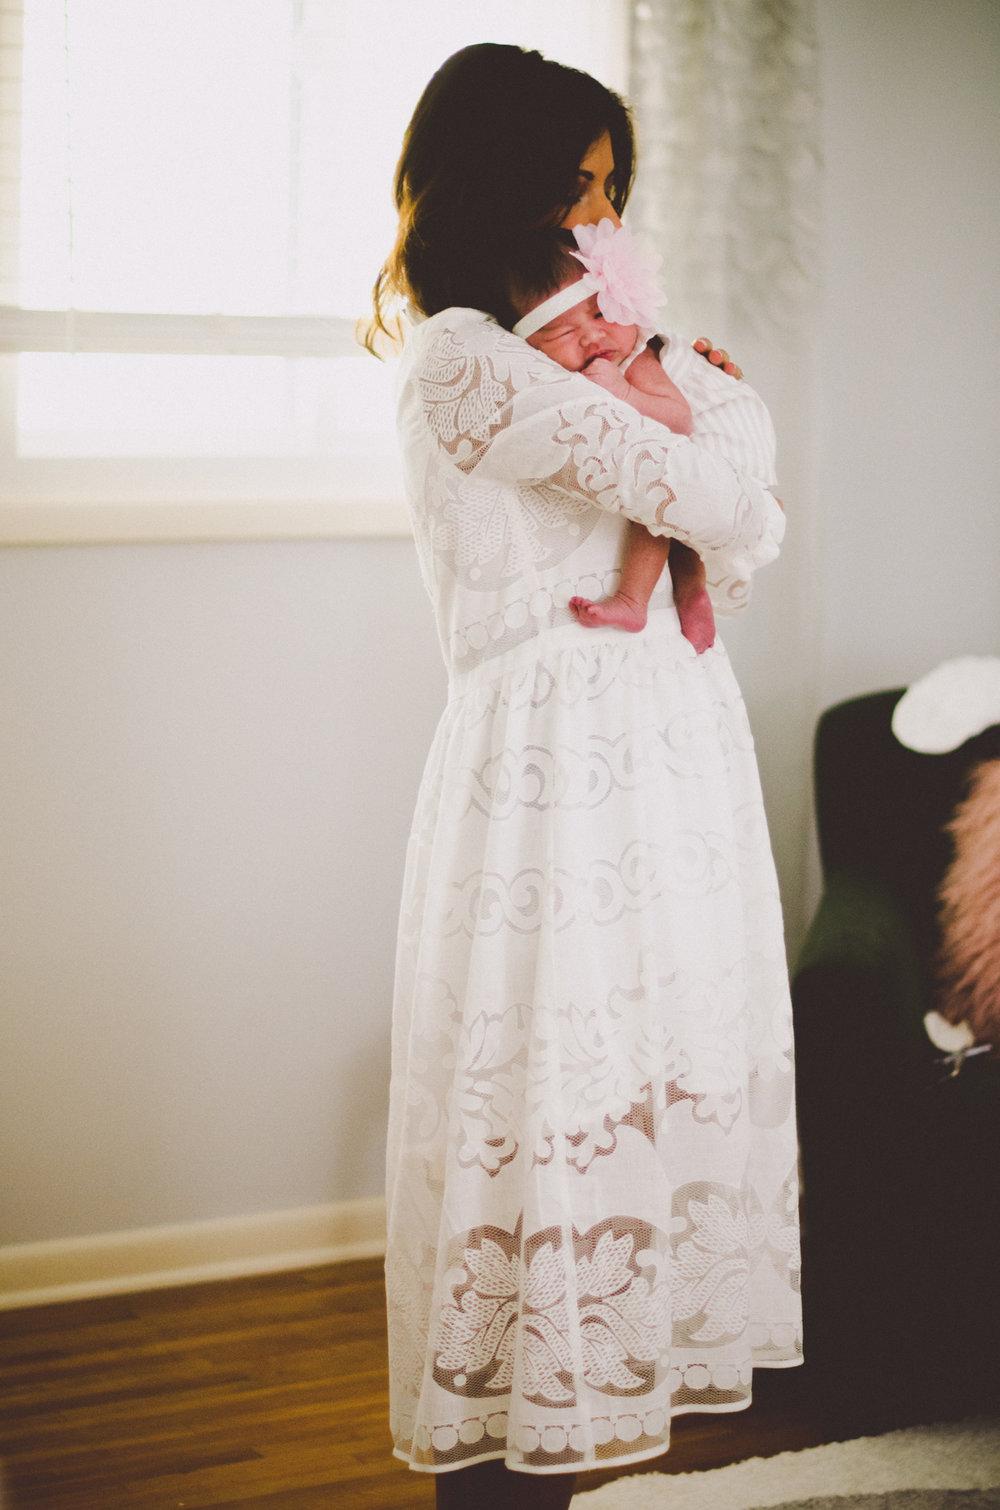 esmeralda-inhome-newborn-session-kelley-raye-atlanta-famlily-photographer-9.jpg